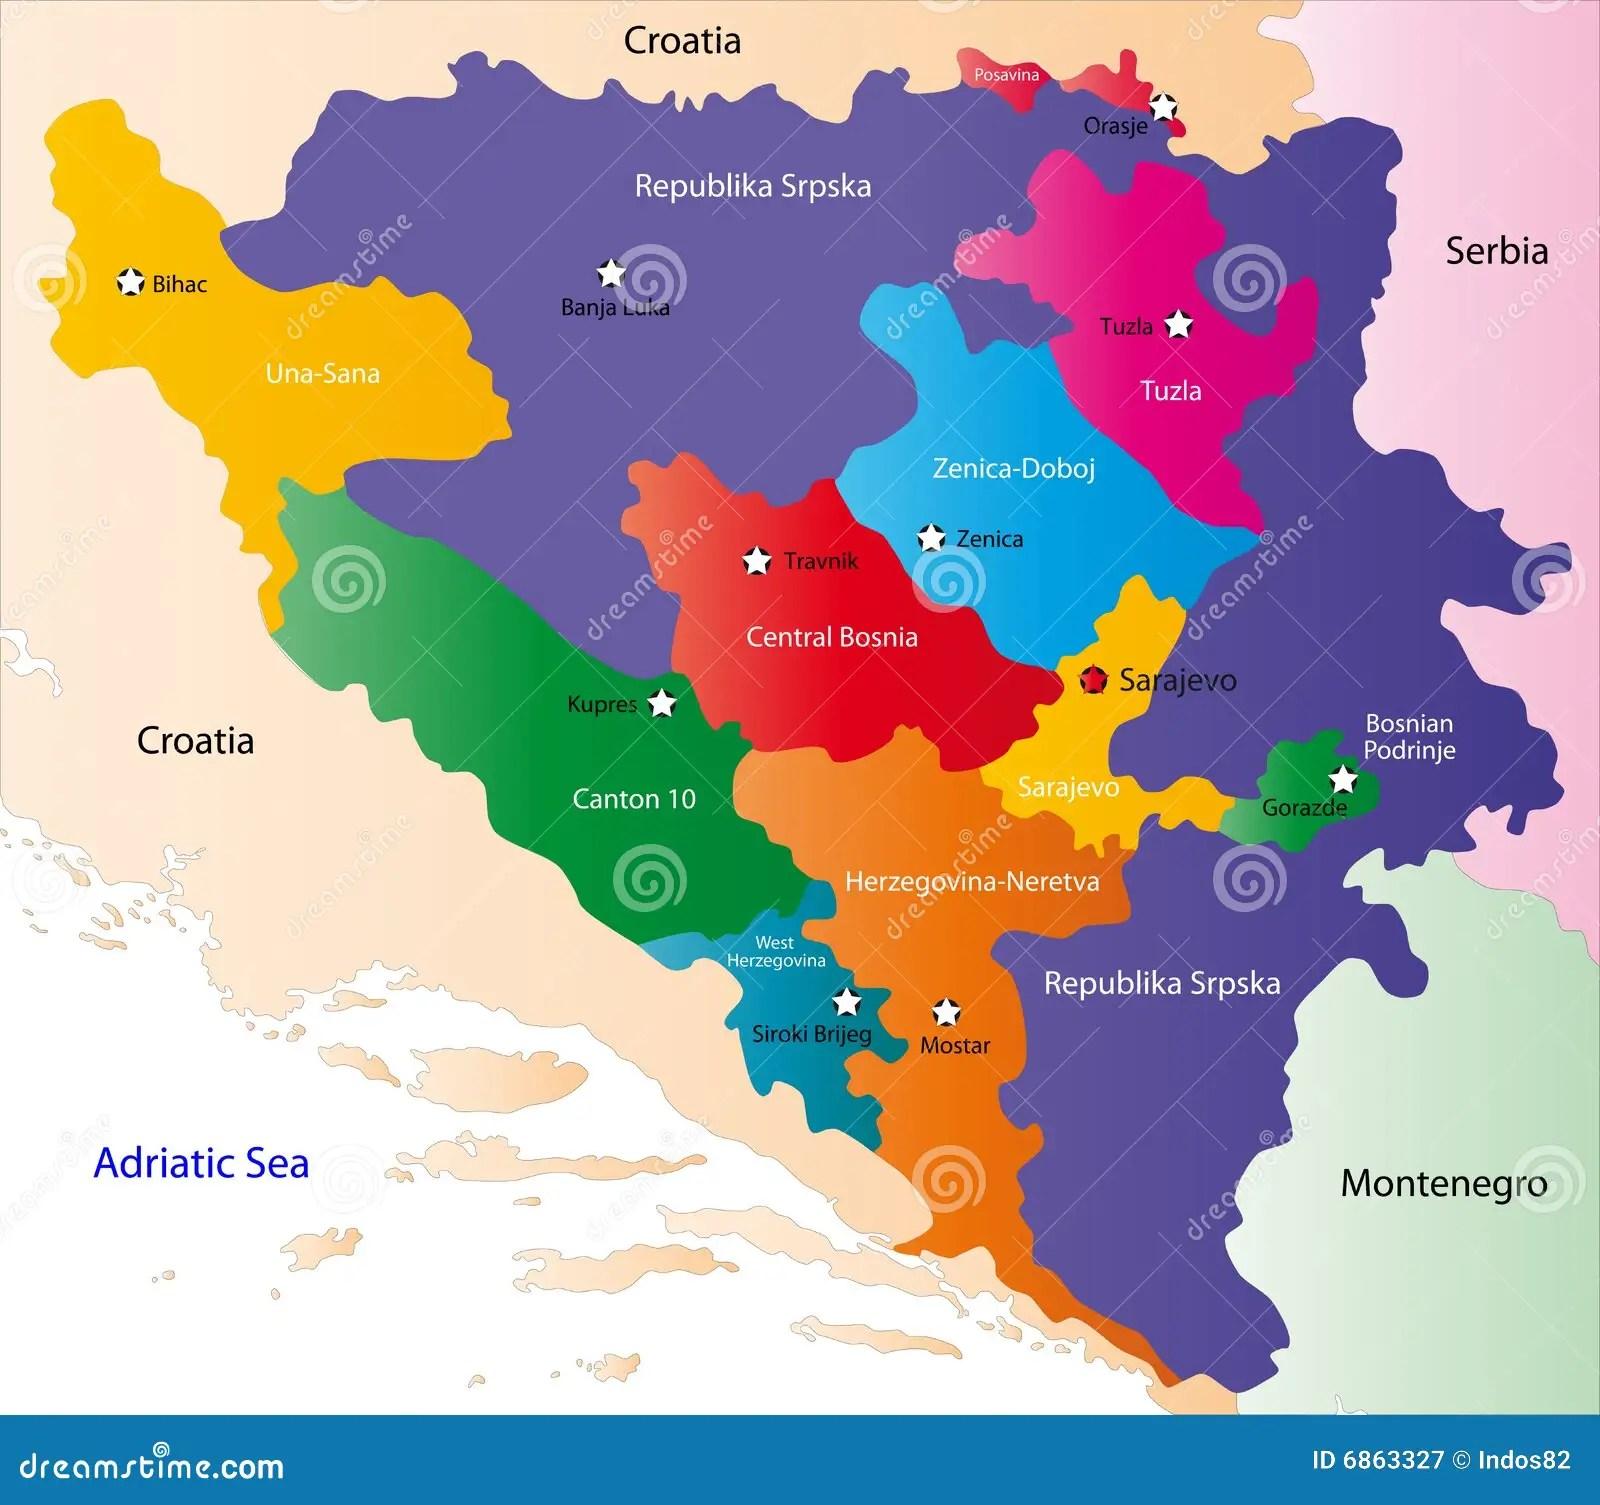 Bosnia Map Stock Illustrations 2 828 Bosnia Map Stock Illustrations Vectors Clipart Dreamstime